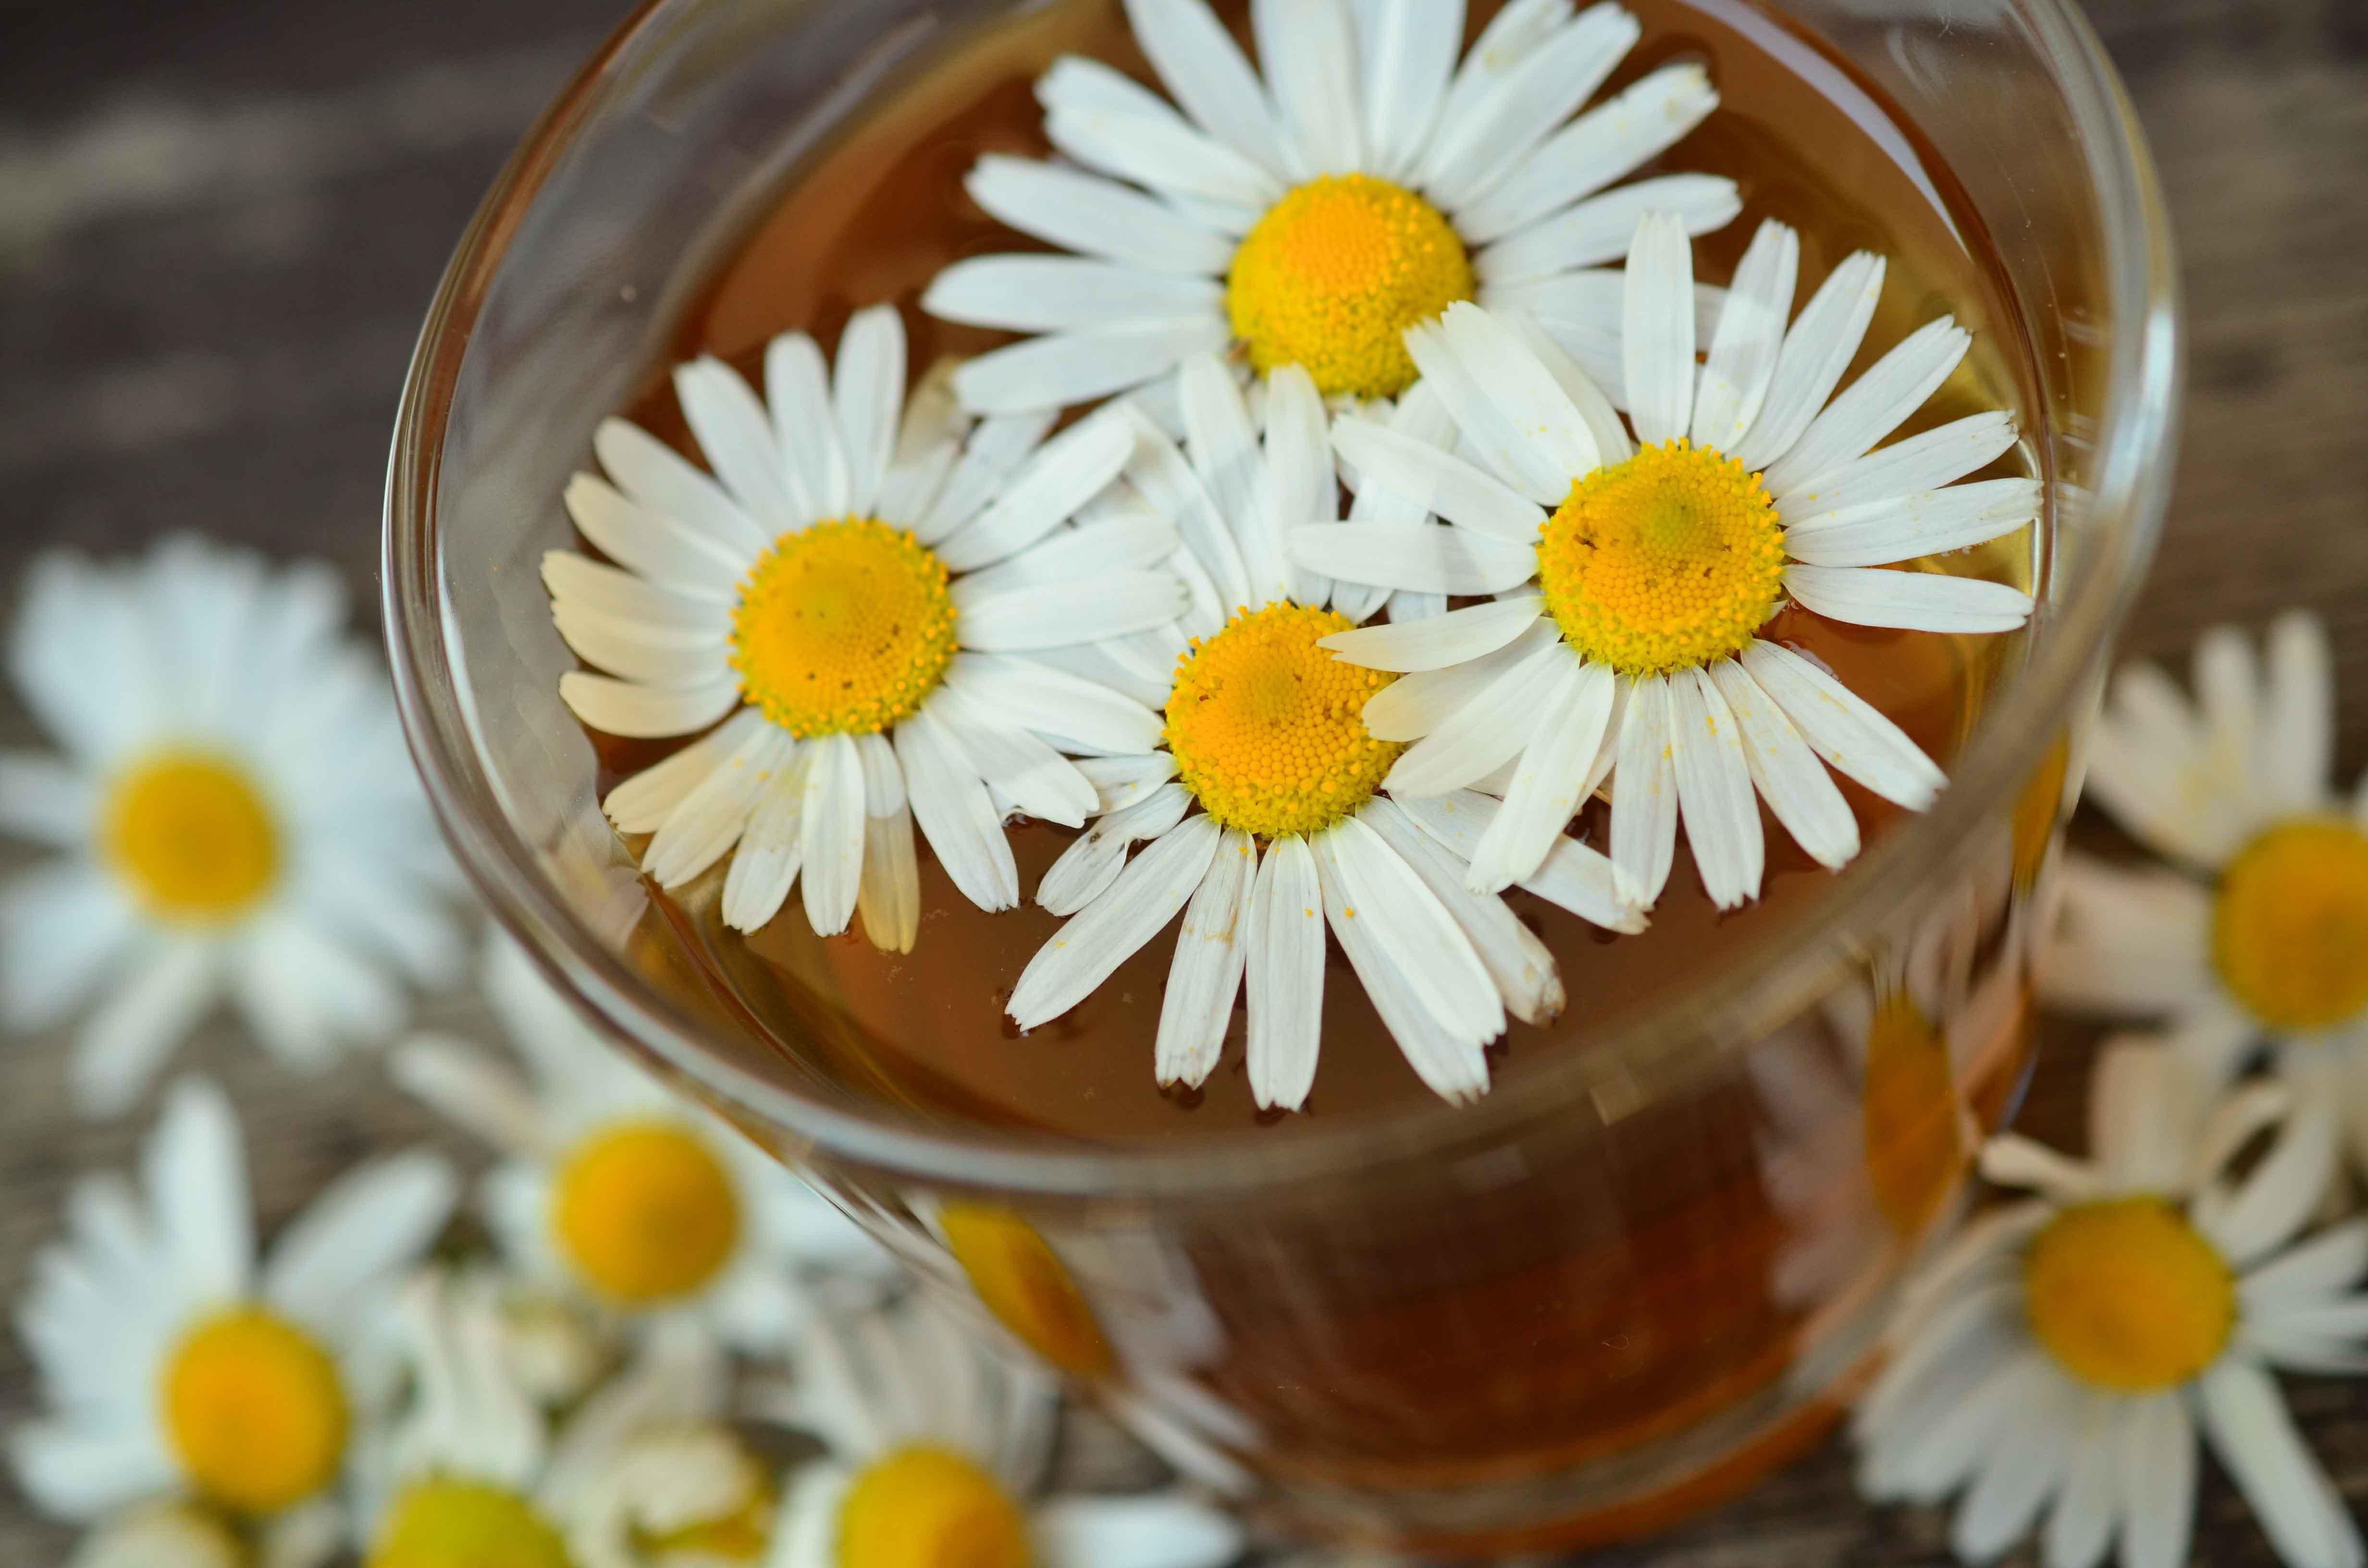 Agua de flores con margaritas encima